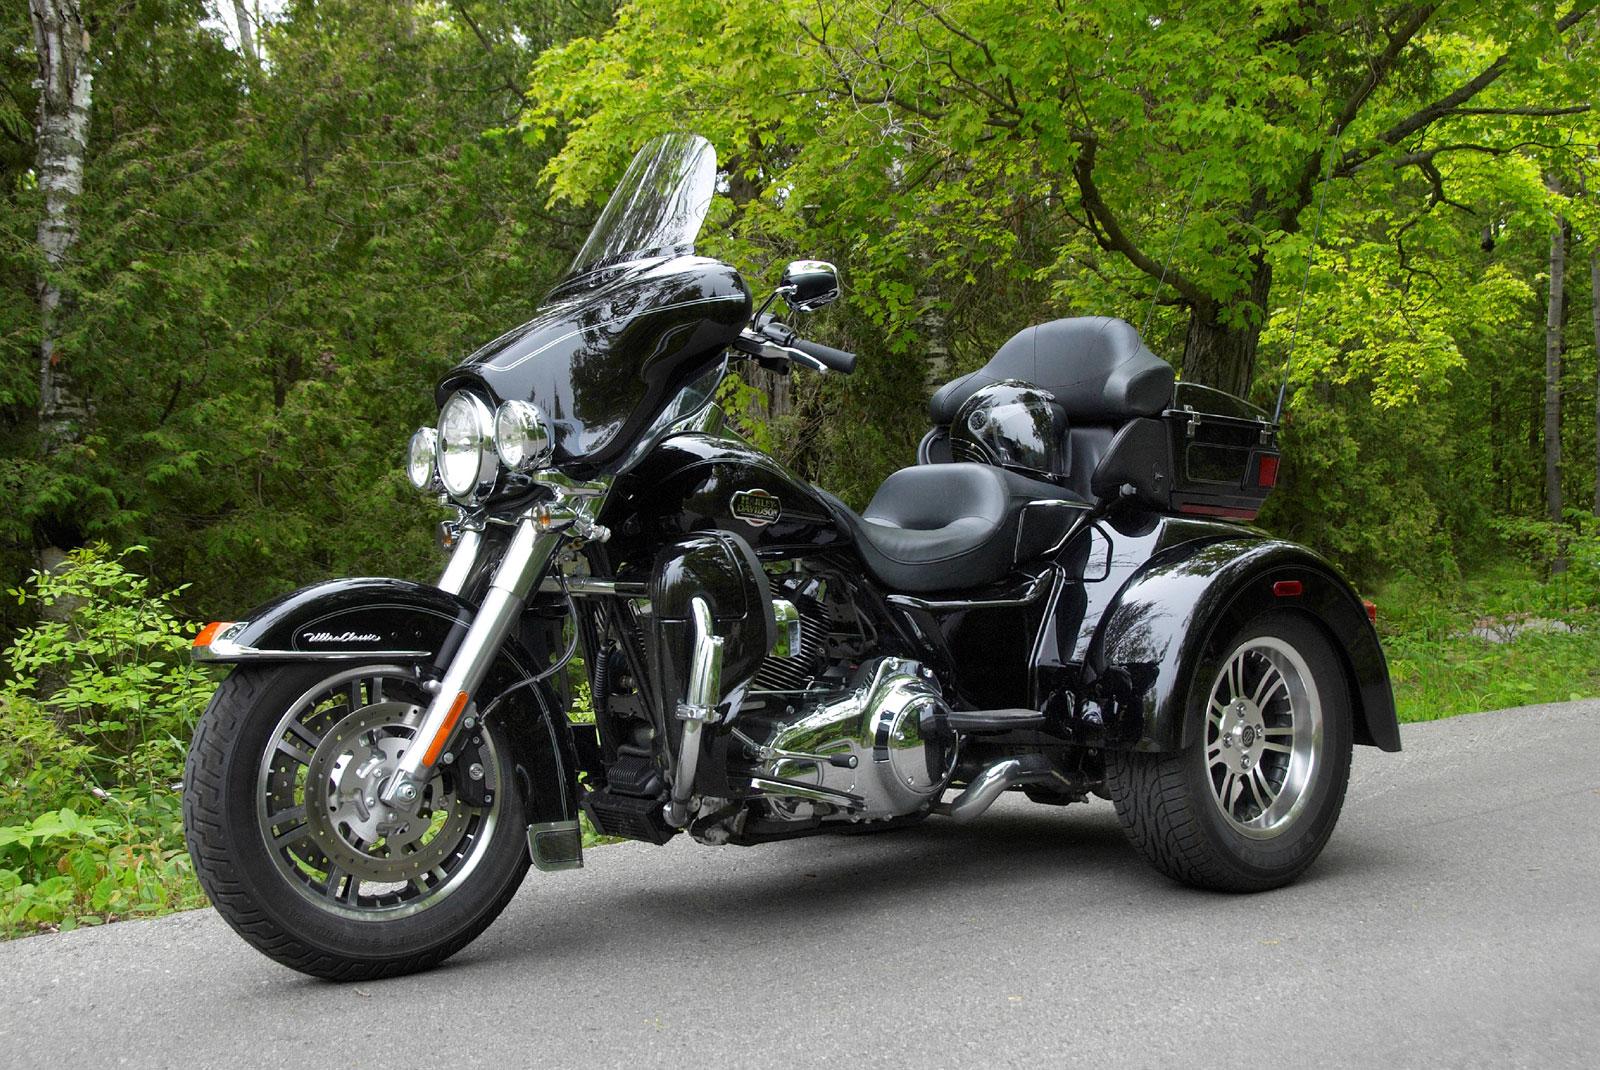 2009 Harley Davidson Tri Glide Ultra Classic FLHTCUTG